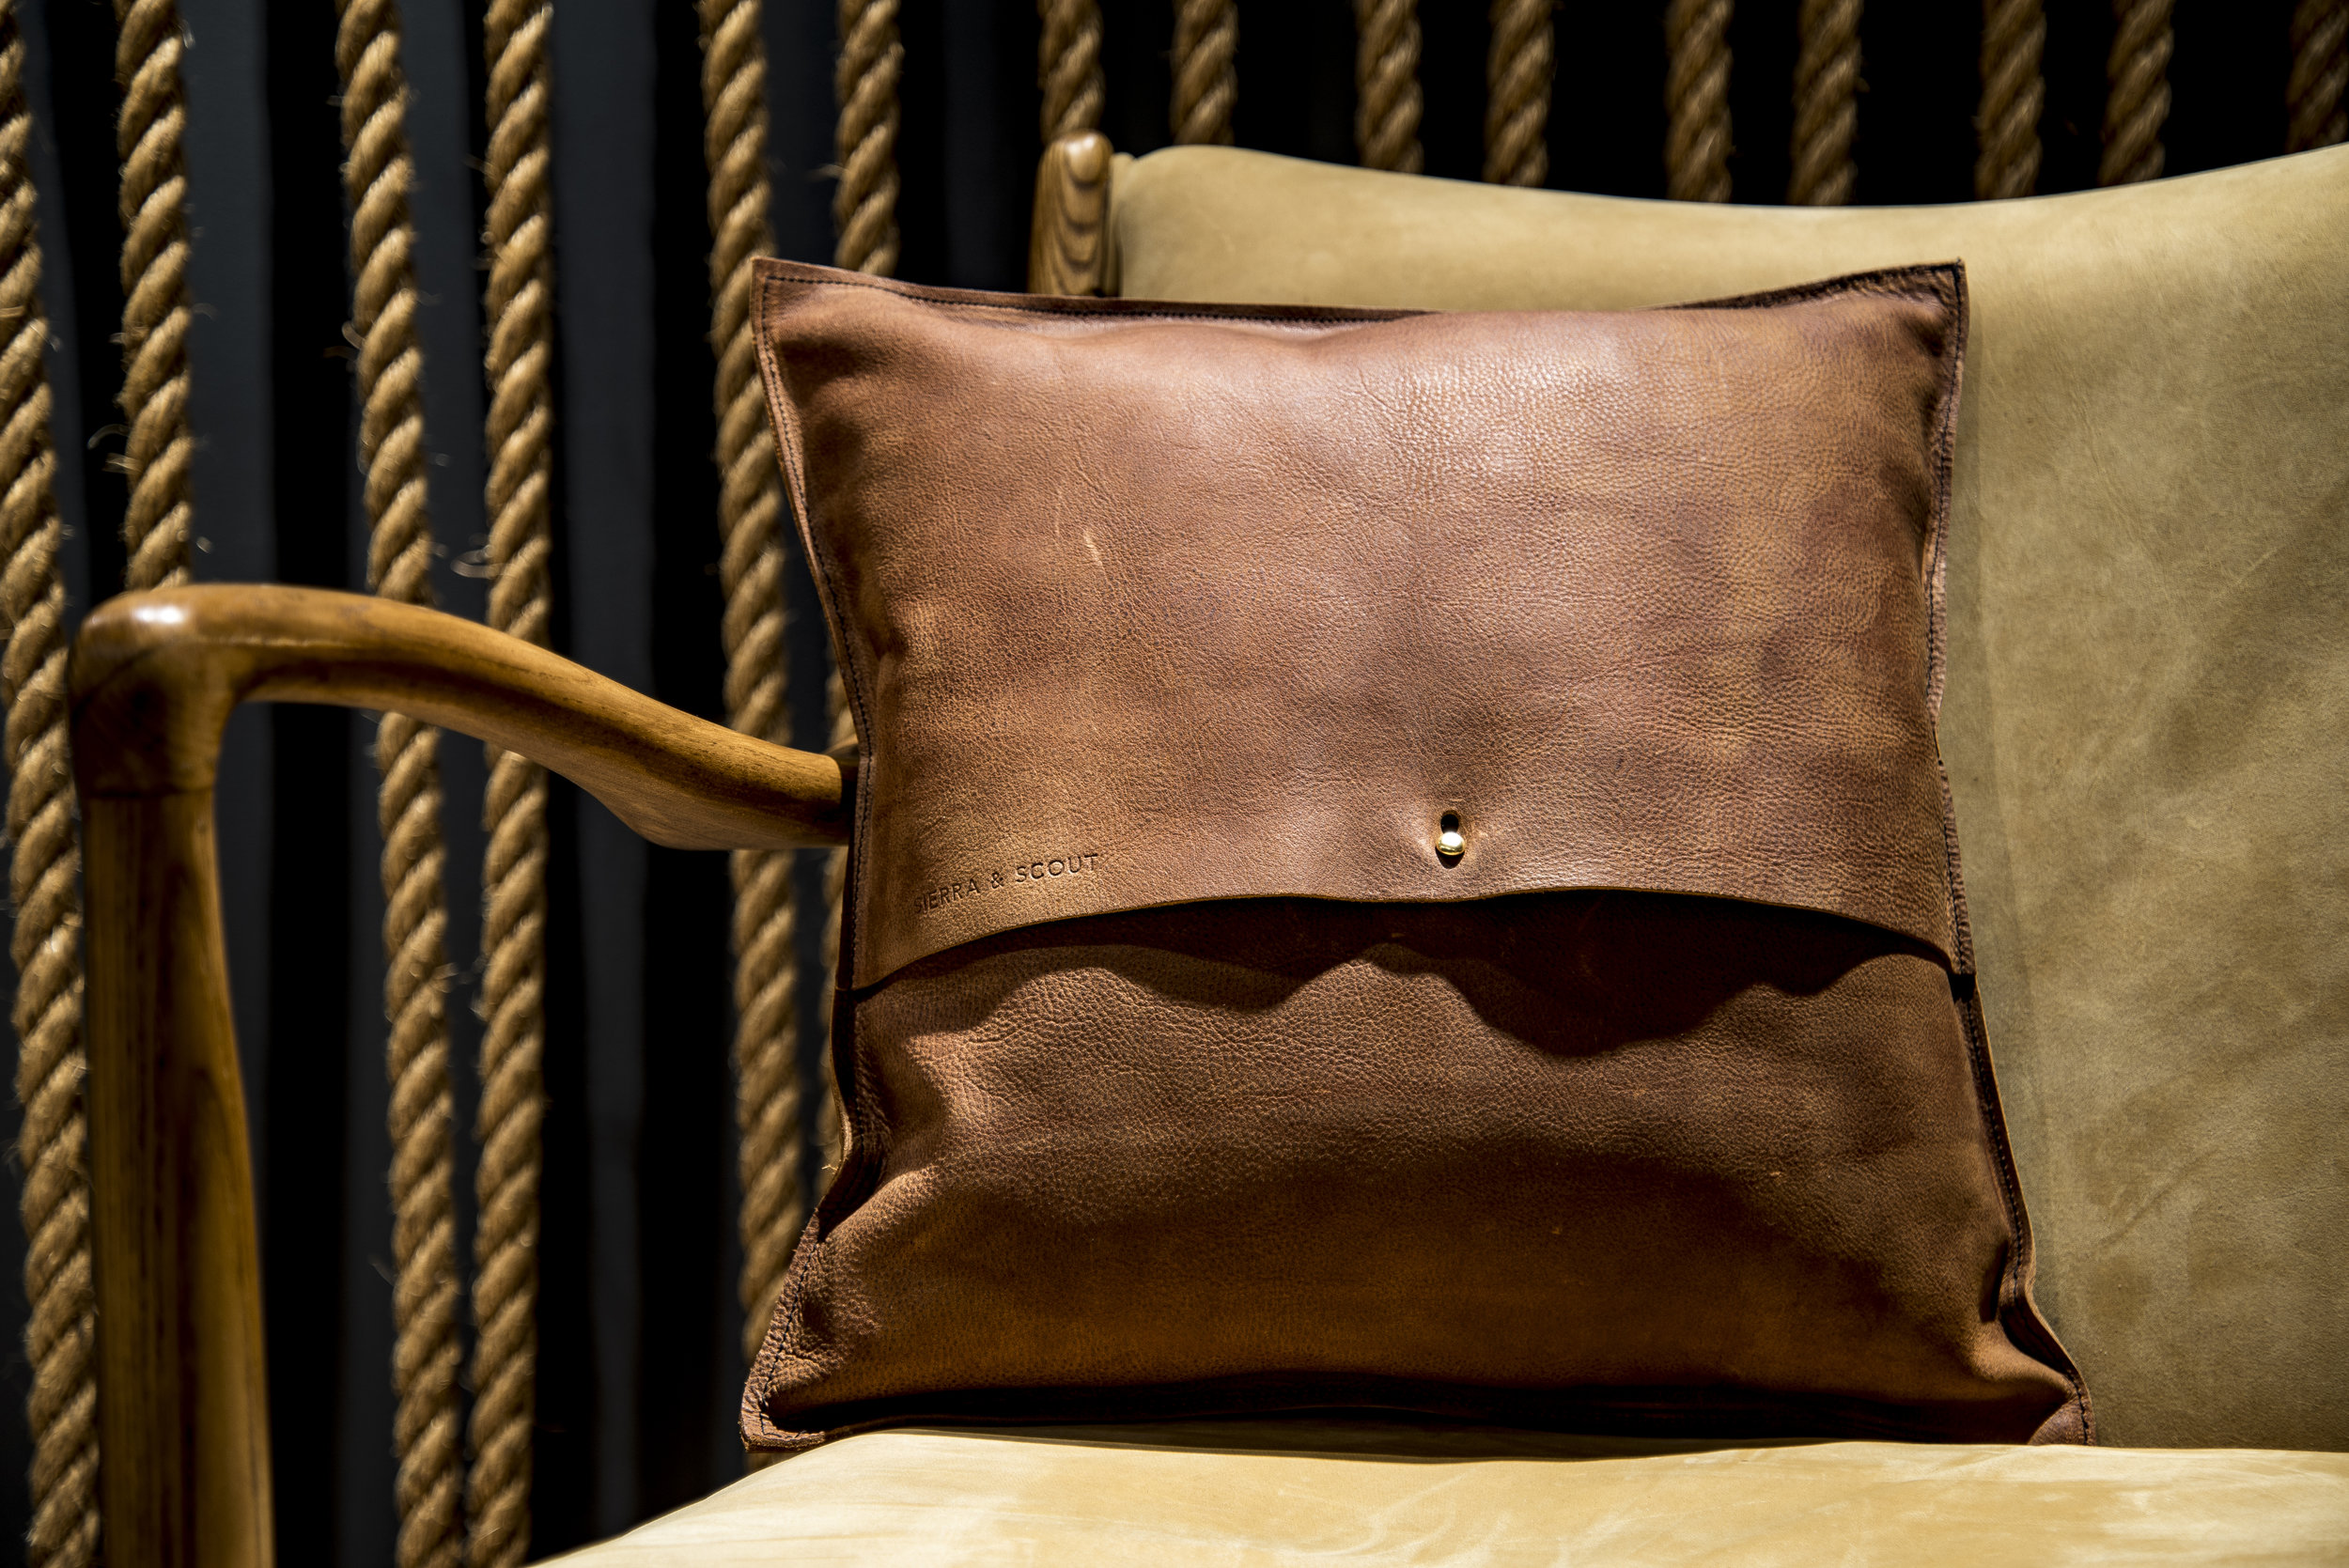 2018-04-14 - Polished Pillow & Belt Shots06.jpg